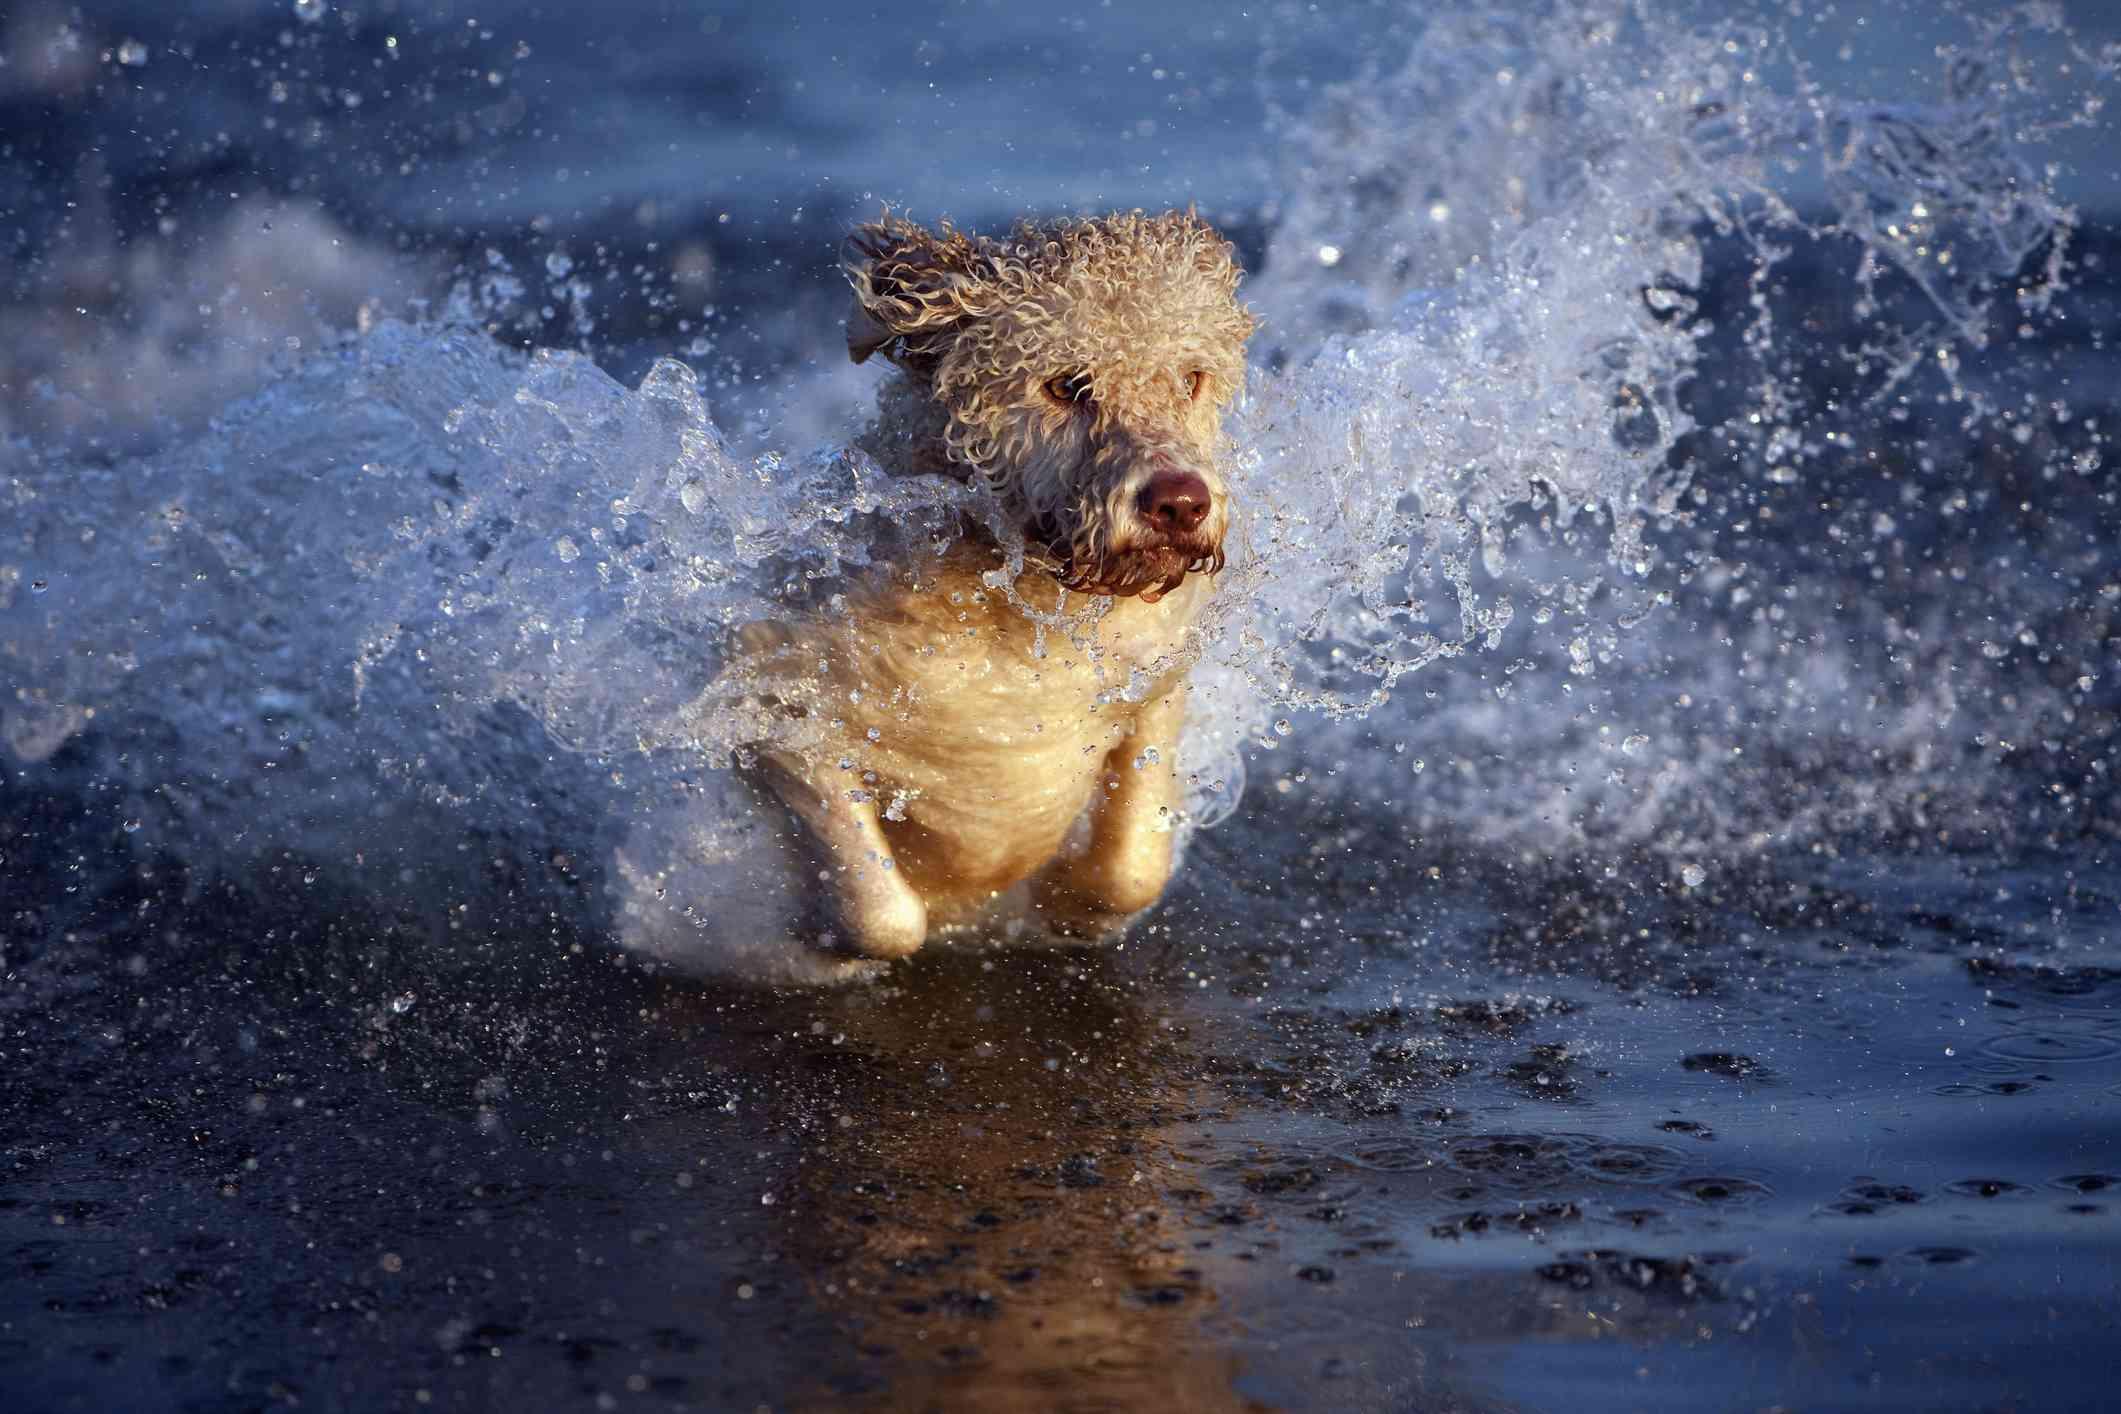 Portuguese Water Dog swimming